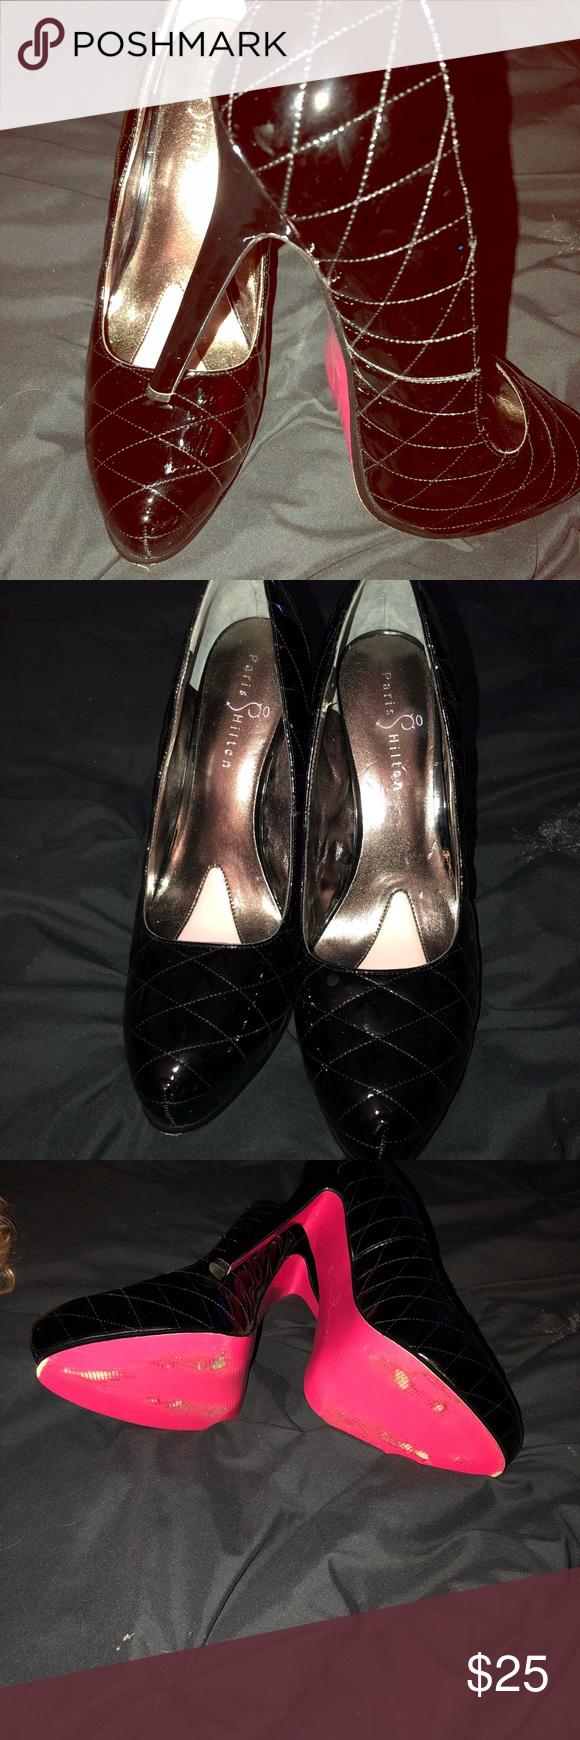 """HOT"" Paris Hilton black patent pump! Barely worn Black"